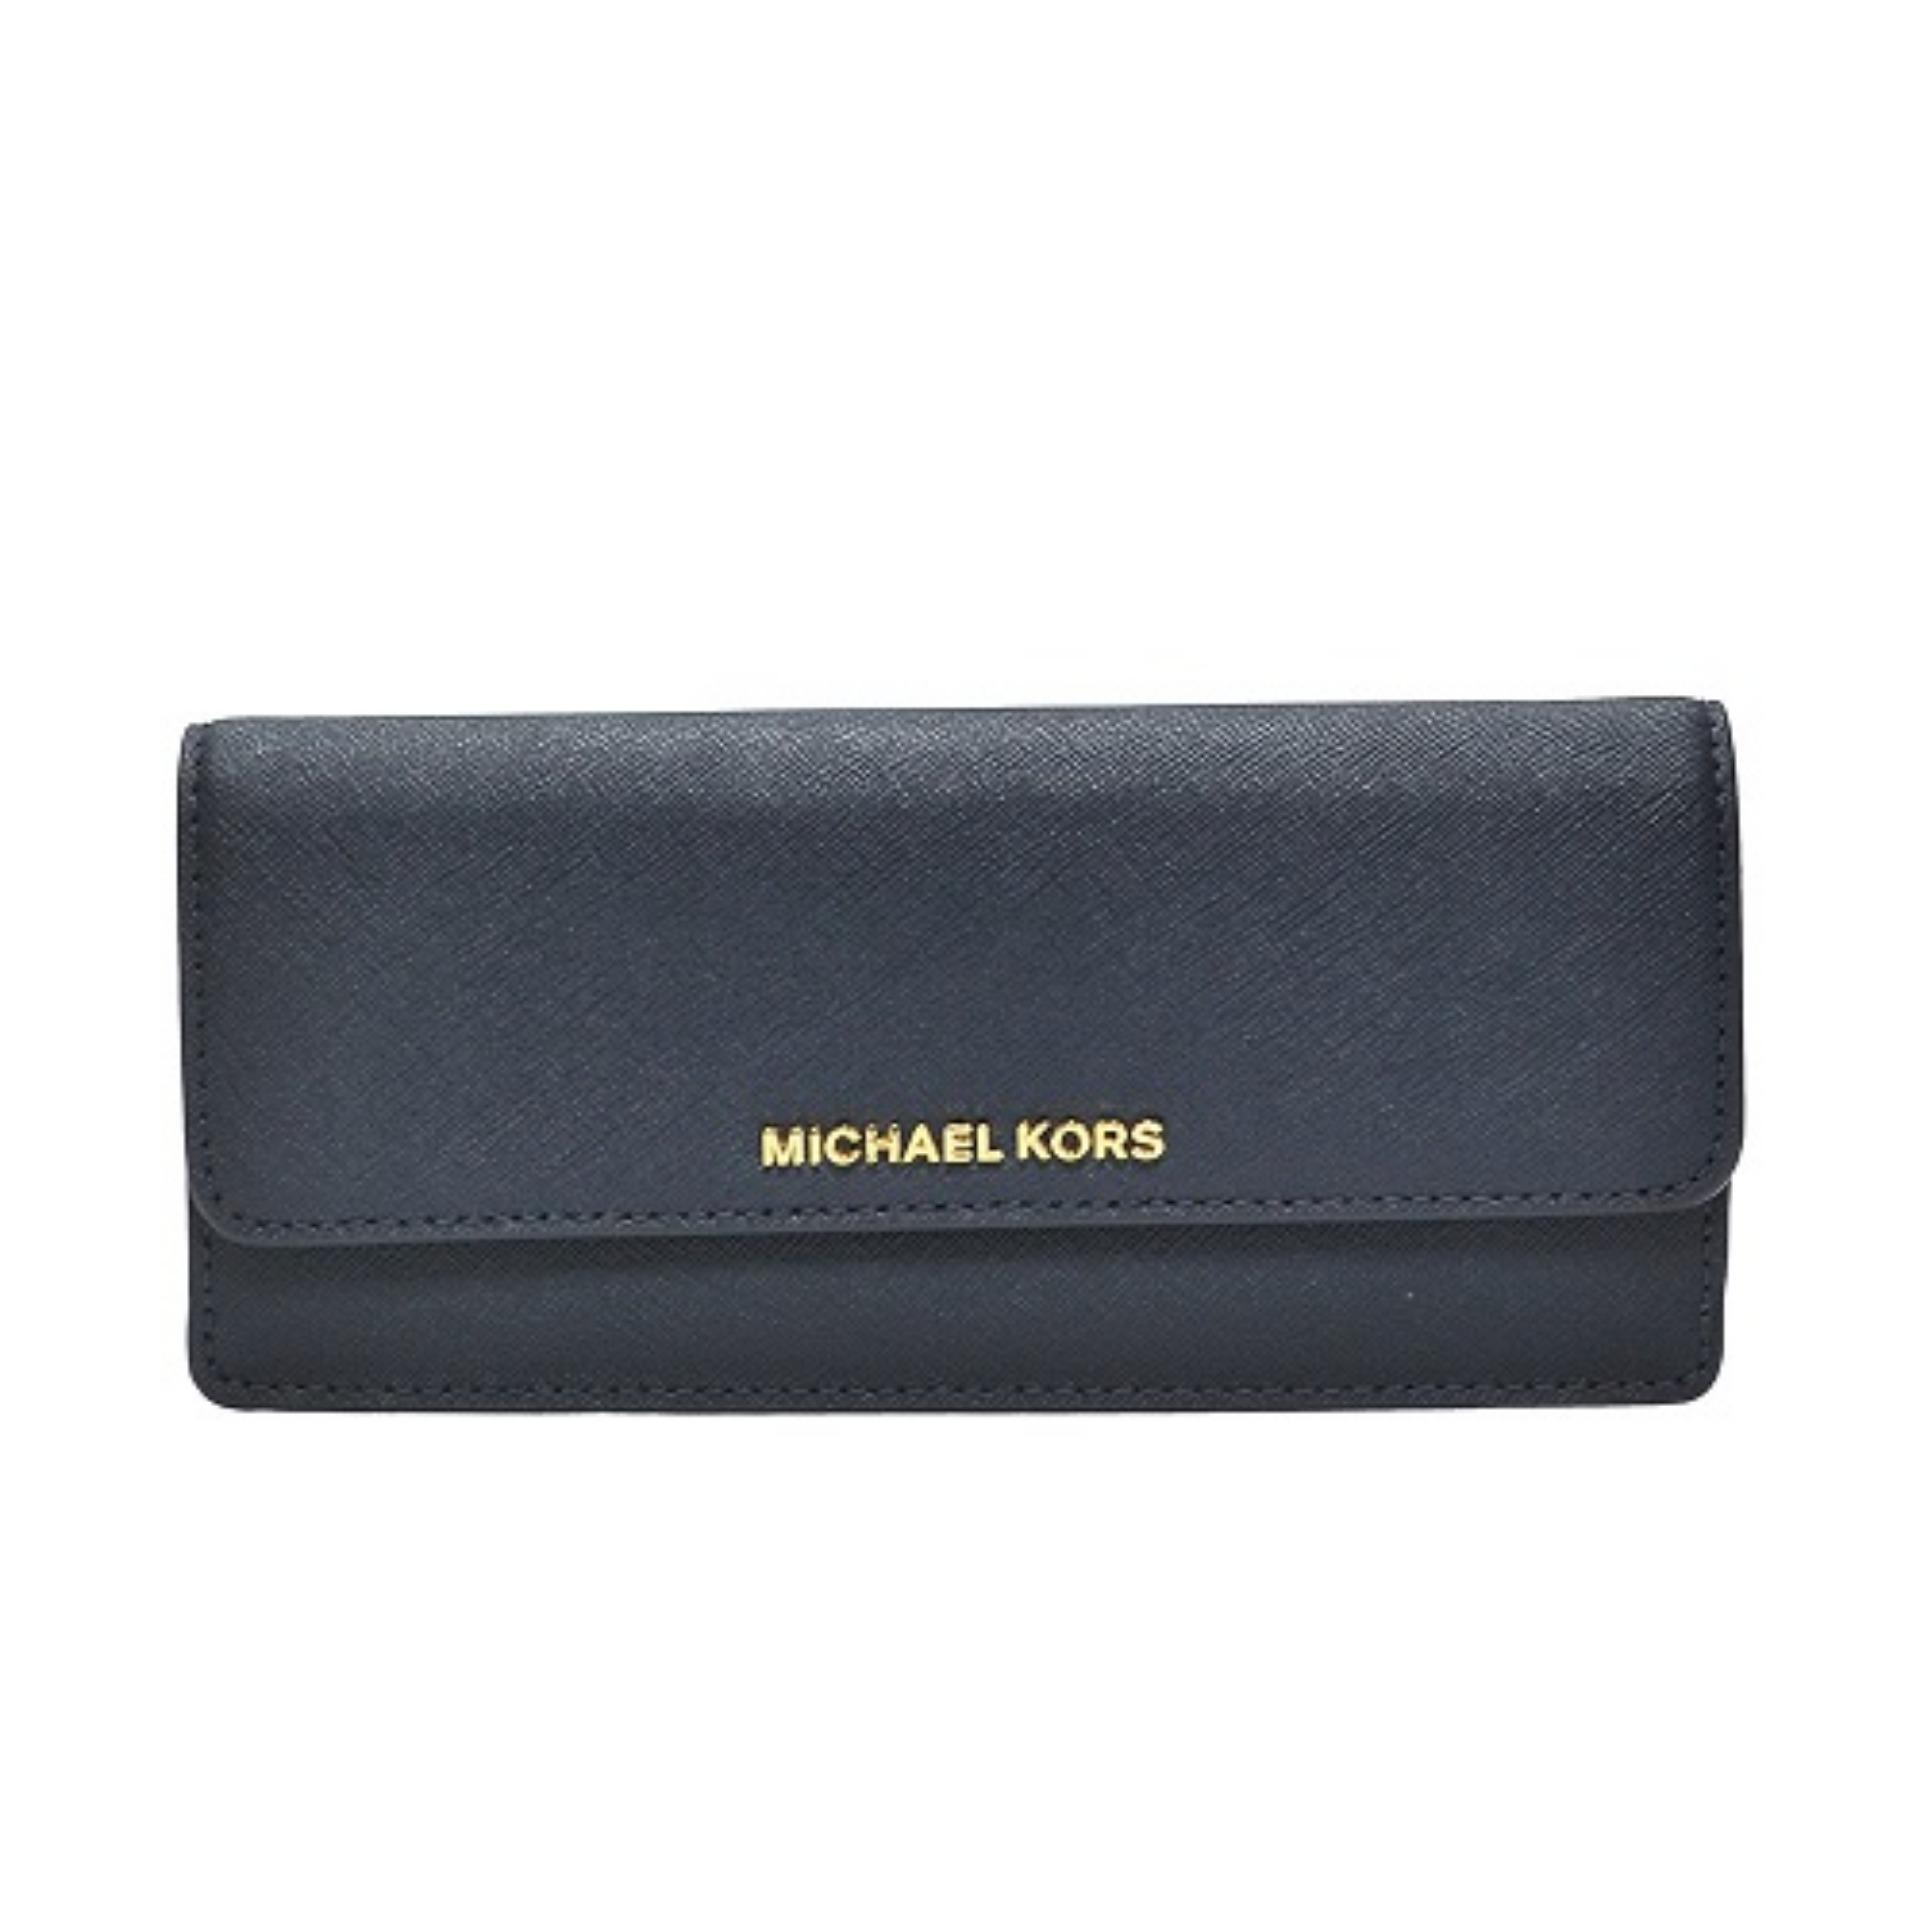 5f6e0275cf2a Michael Kors Jet Set Travel Slim Gold Tone Saffiano Wallet (Admiral)    32F3GTVE7LADMIRAL